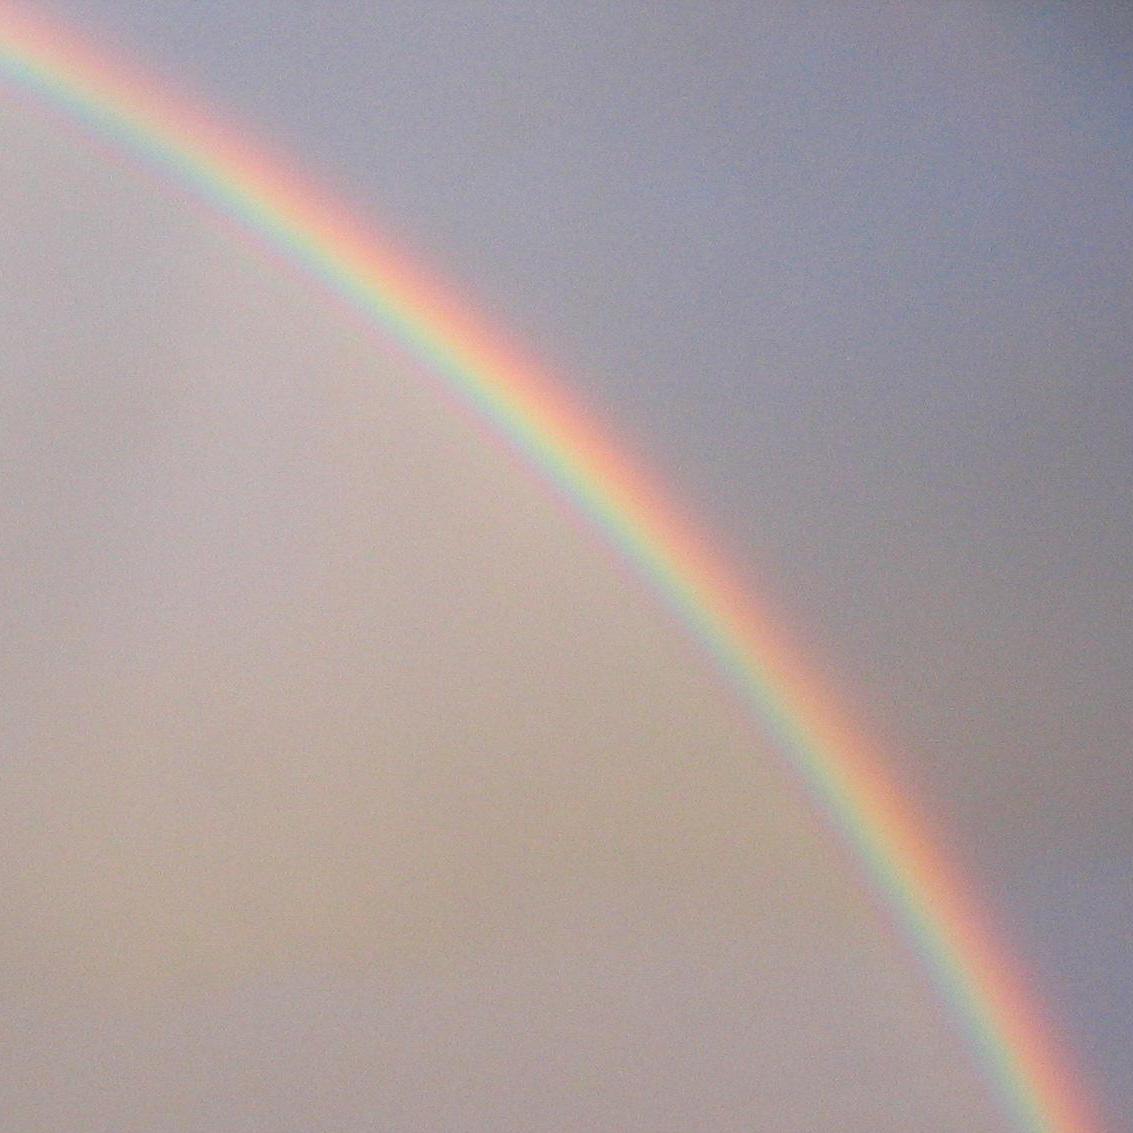 rainbow bg